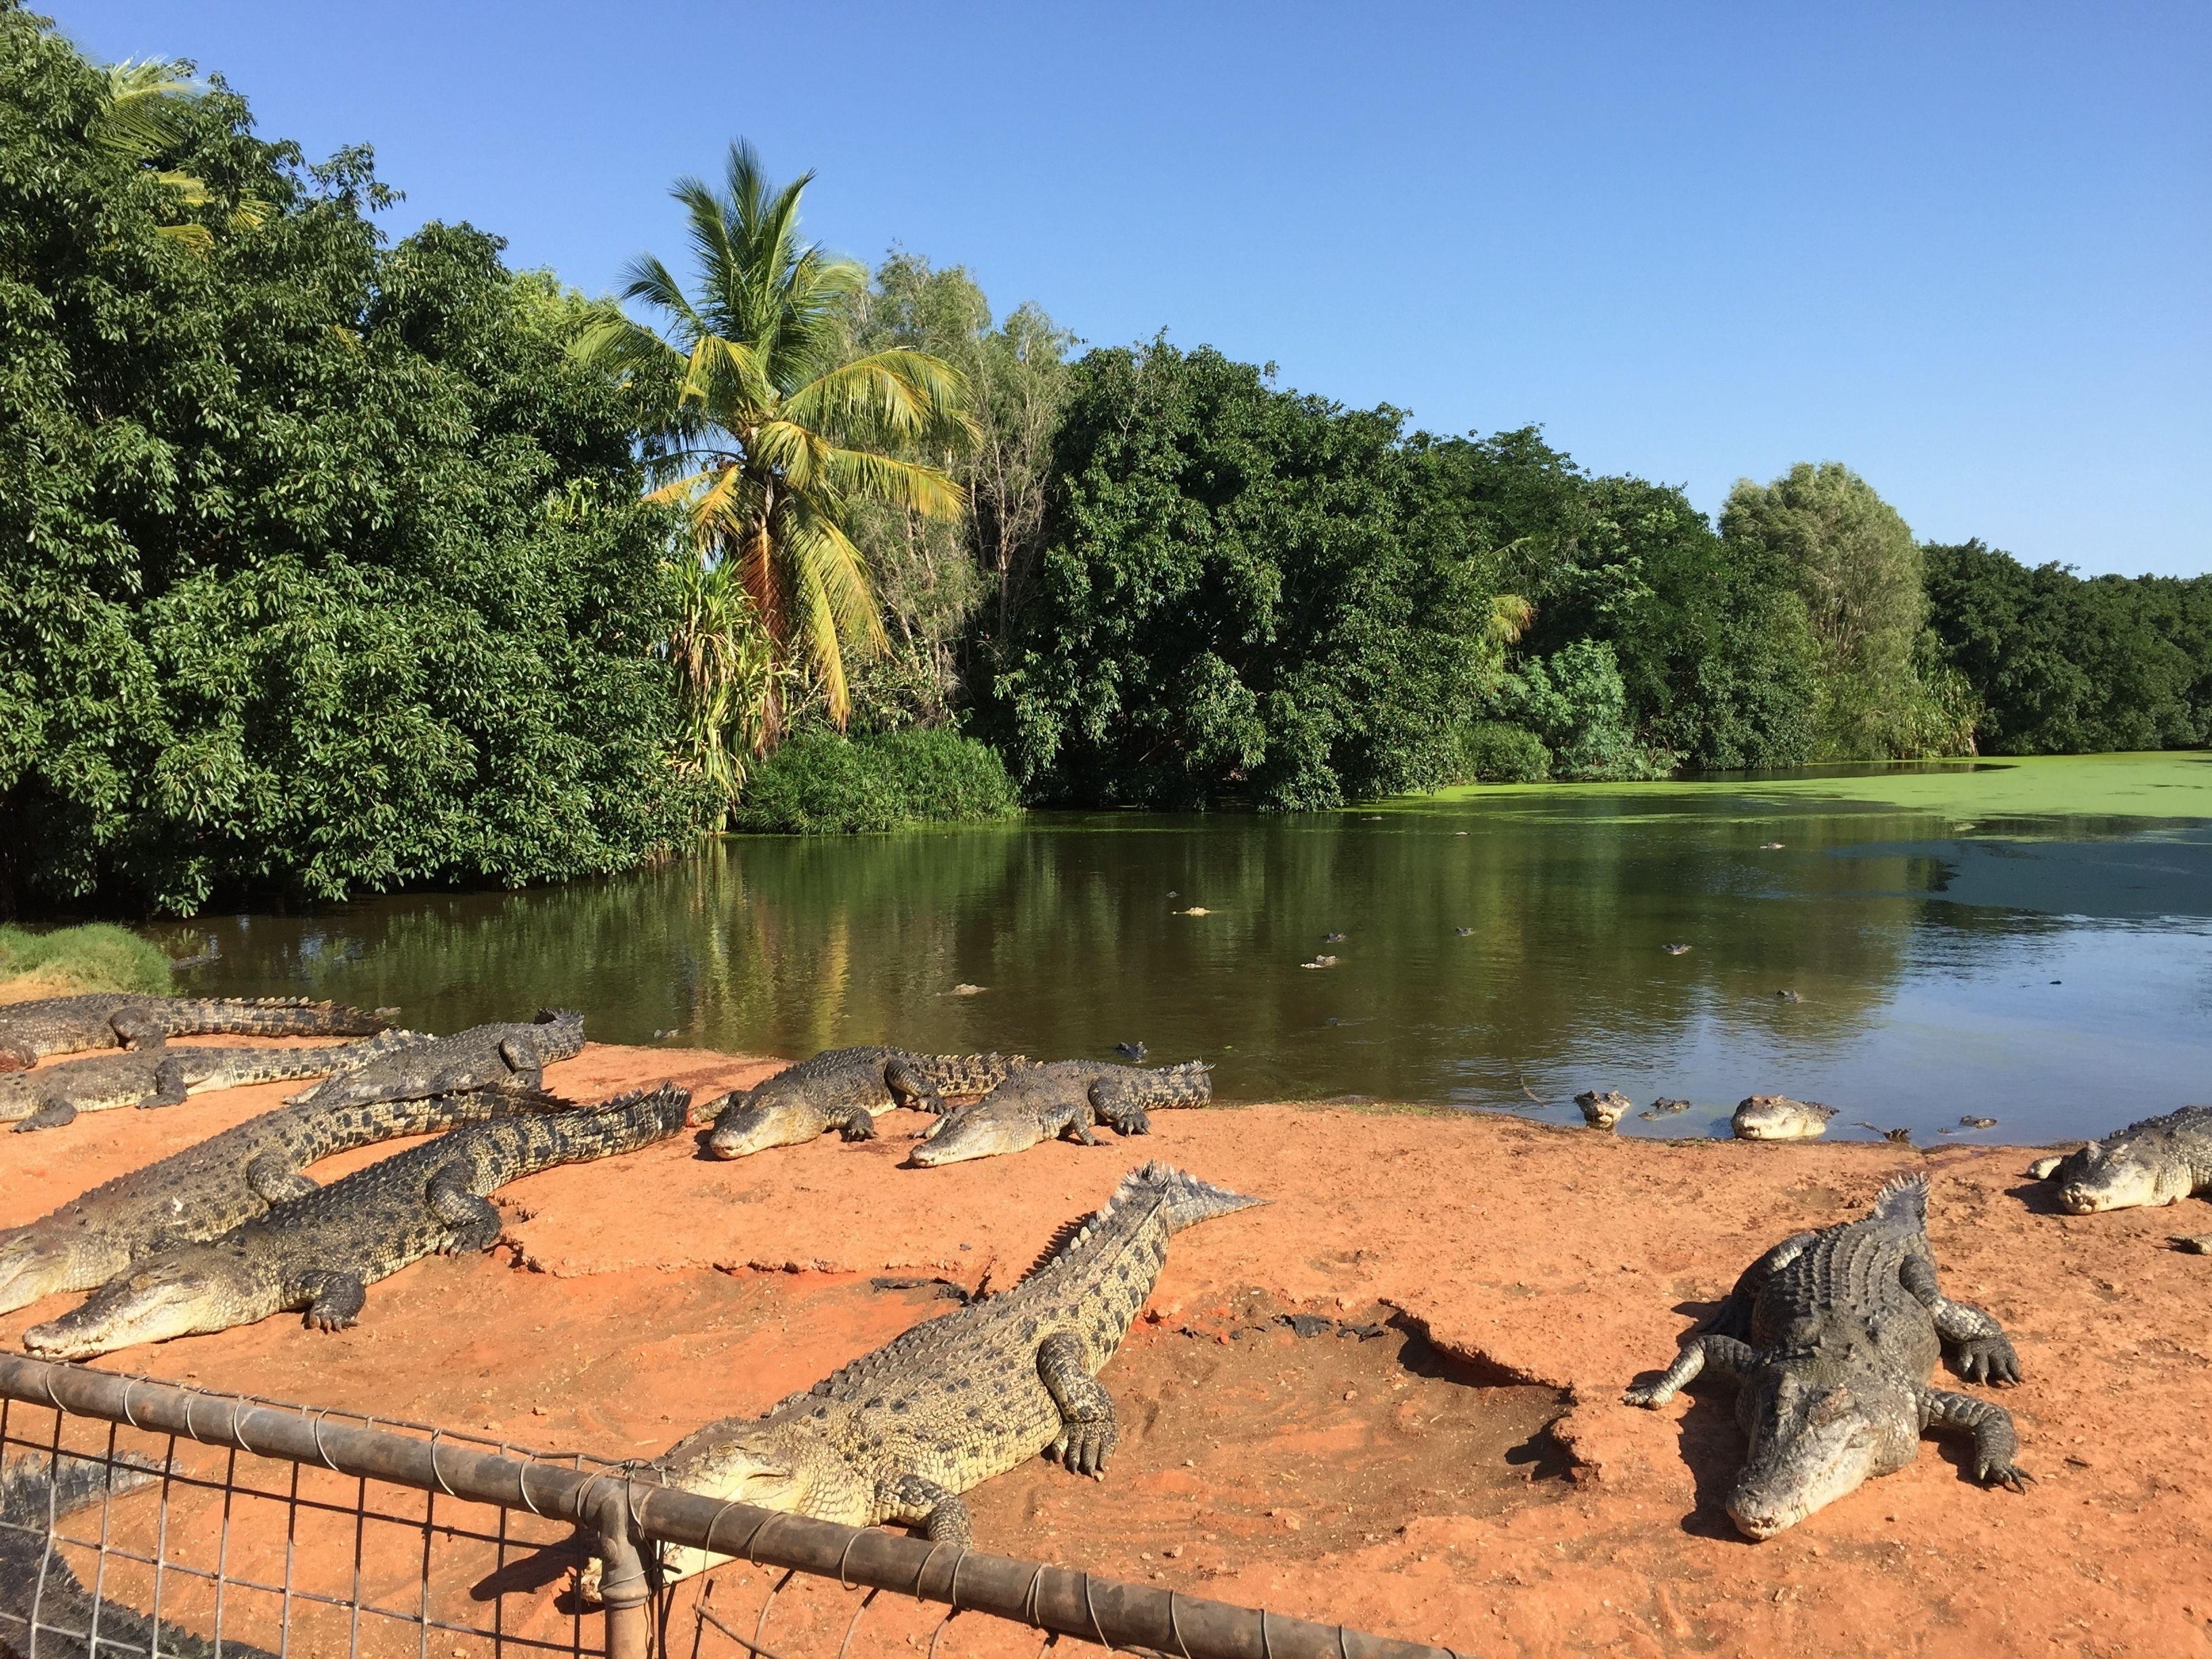 Broome 3 in 1 Tour: Croc Park, Bird Park & Mango Place